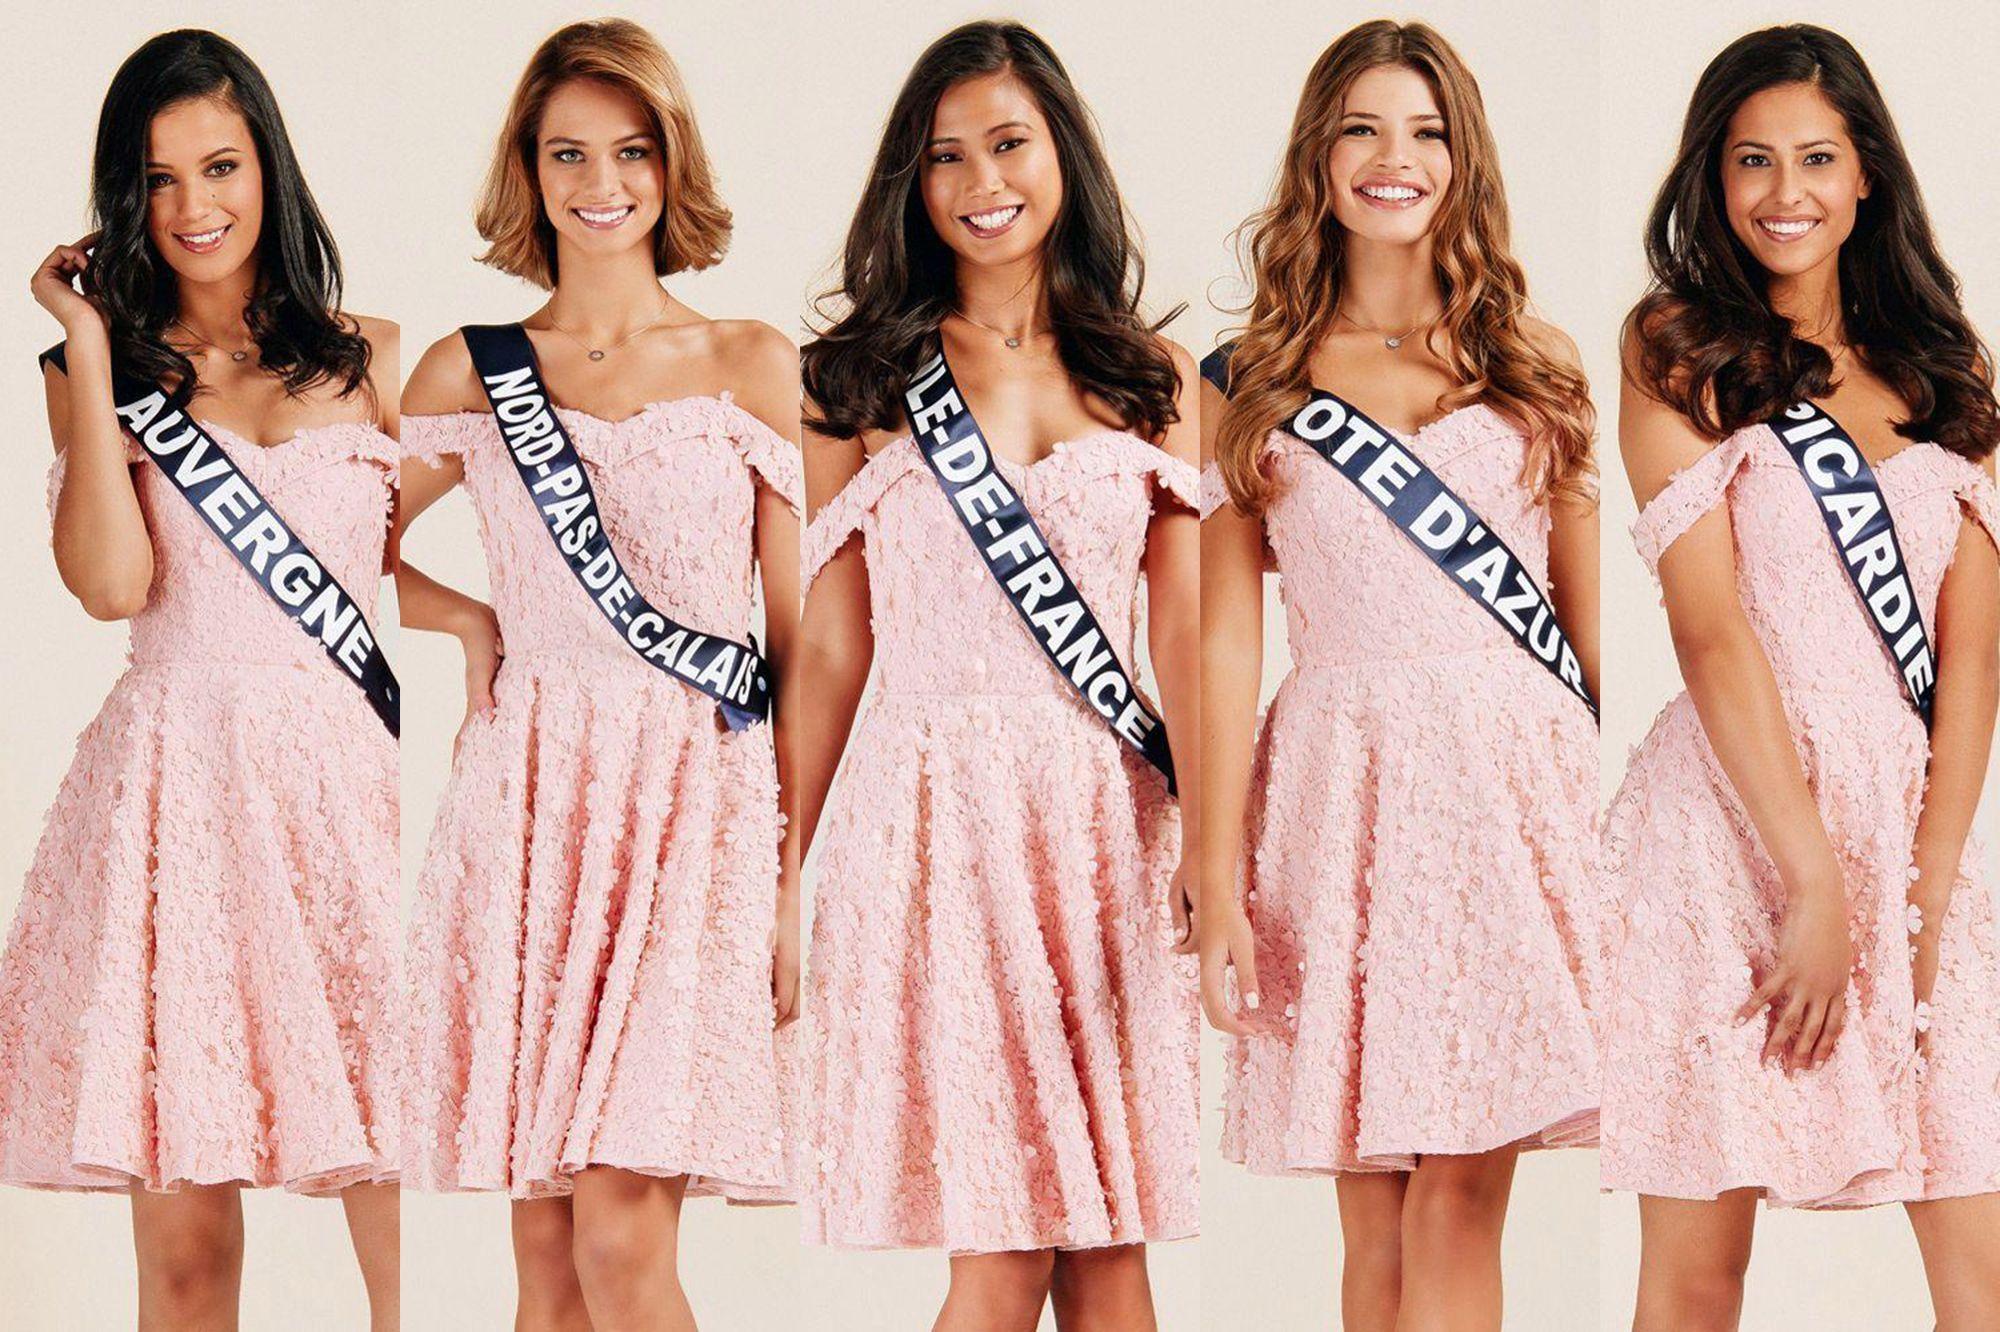 https://resize-parismatch.lanmedia.fr/img/var/news/storage/images/paris-match/people/miss-france-2020-les-portrtaits-officiels-des-30-candidates-1659805/27073891-1-fre-FR/Miss-France-2020-les-portrtaits-officiels-des-30-candidates.jpg